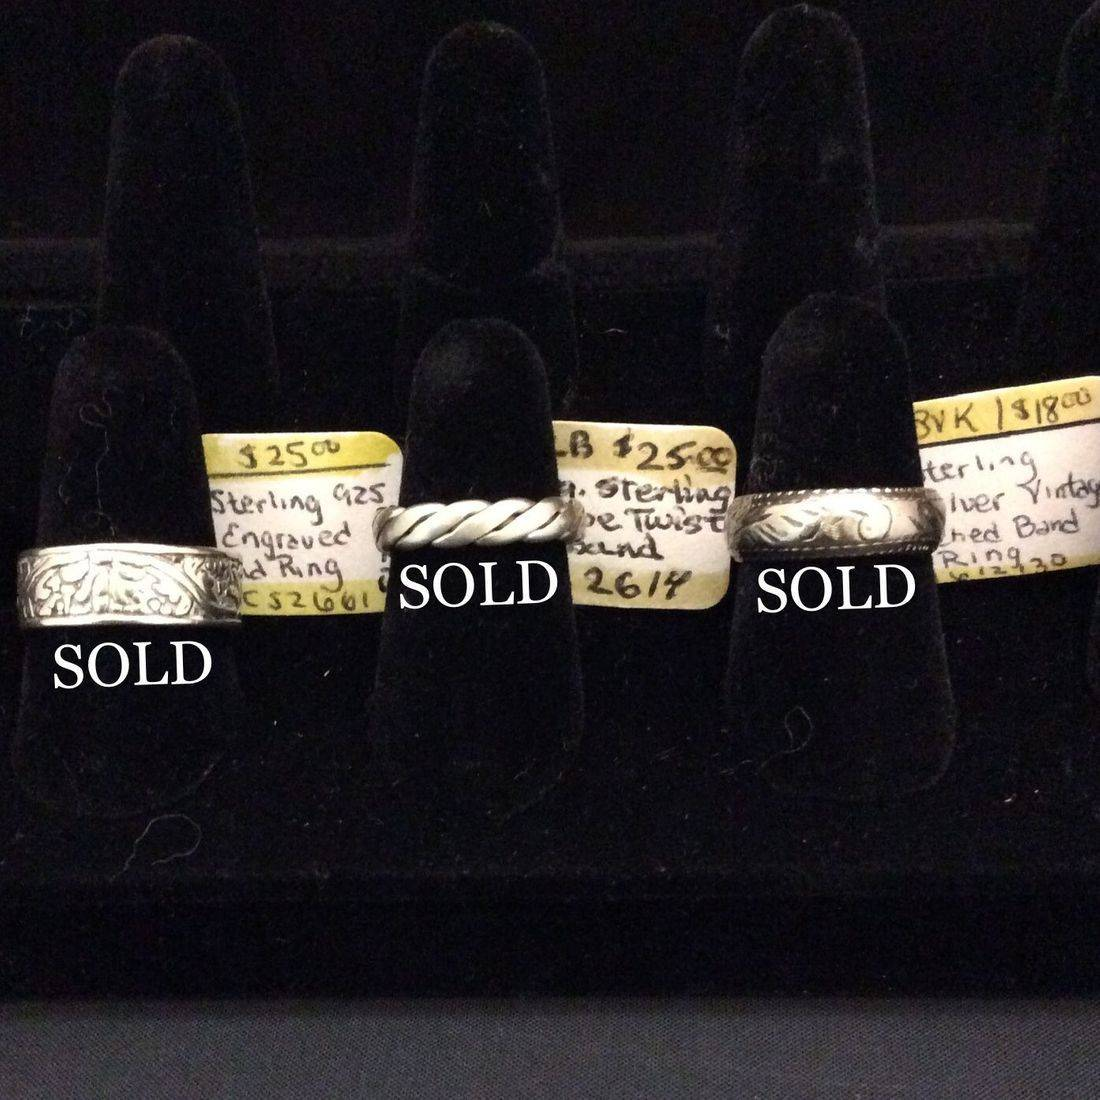 Sterling .925 Engraved, Band Ring  $25,  Vin. Sterling Sil., Rope Twist Band  $25,  Vin. Sterling Sil., Etched Band, Ring  $18.00